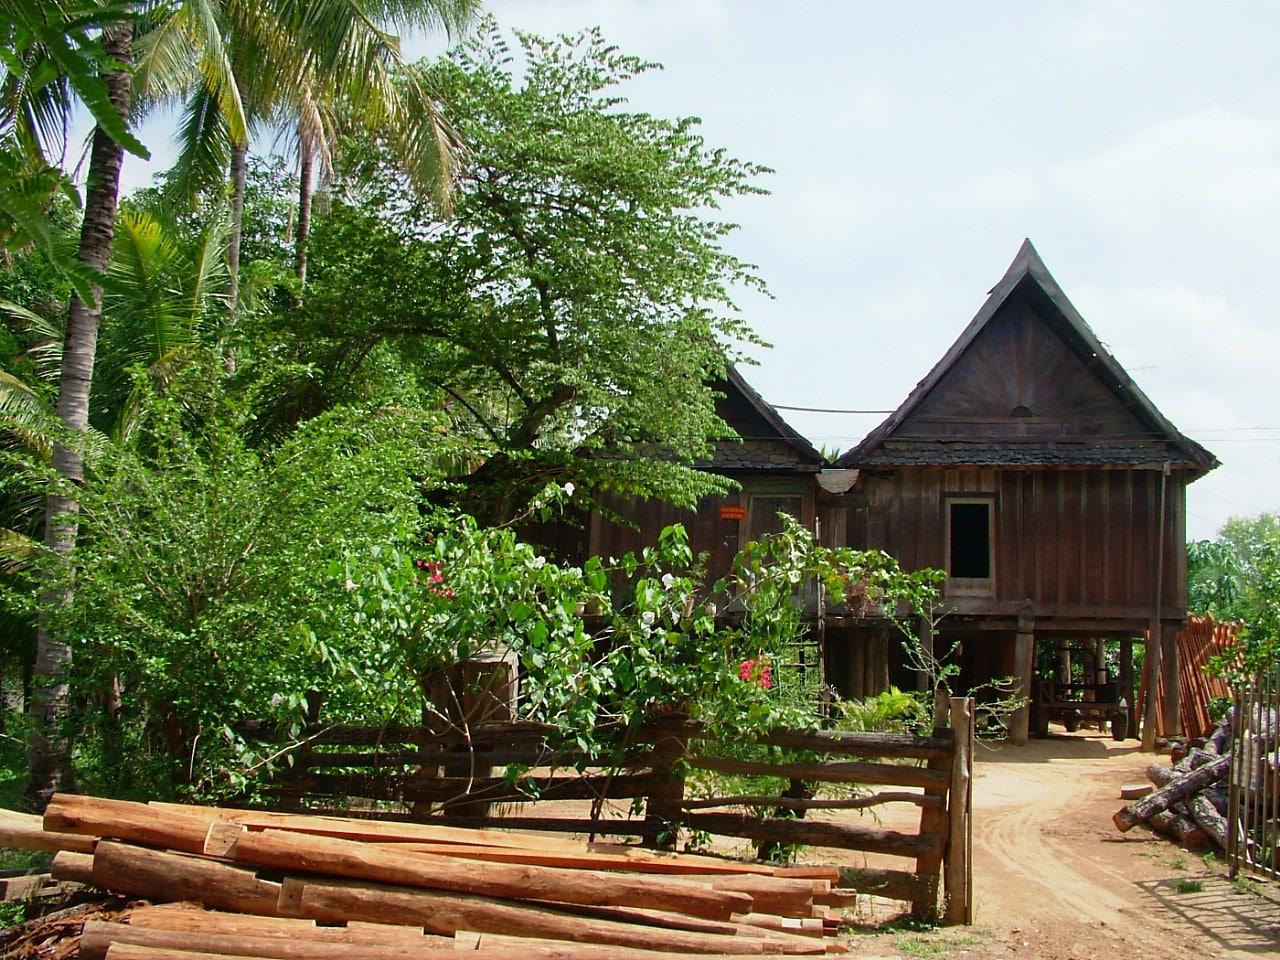 Image of a Lao Stilt House in Ban Don Village in Da Lak Province, Vietnam